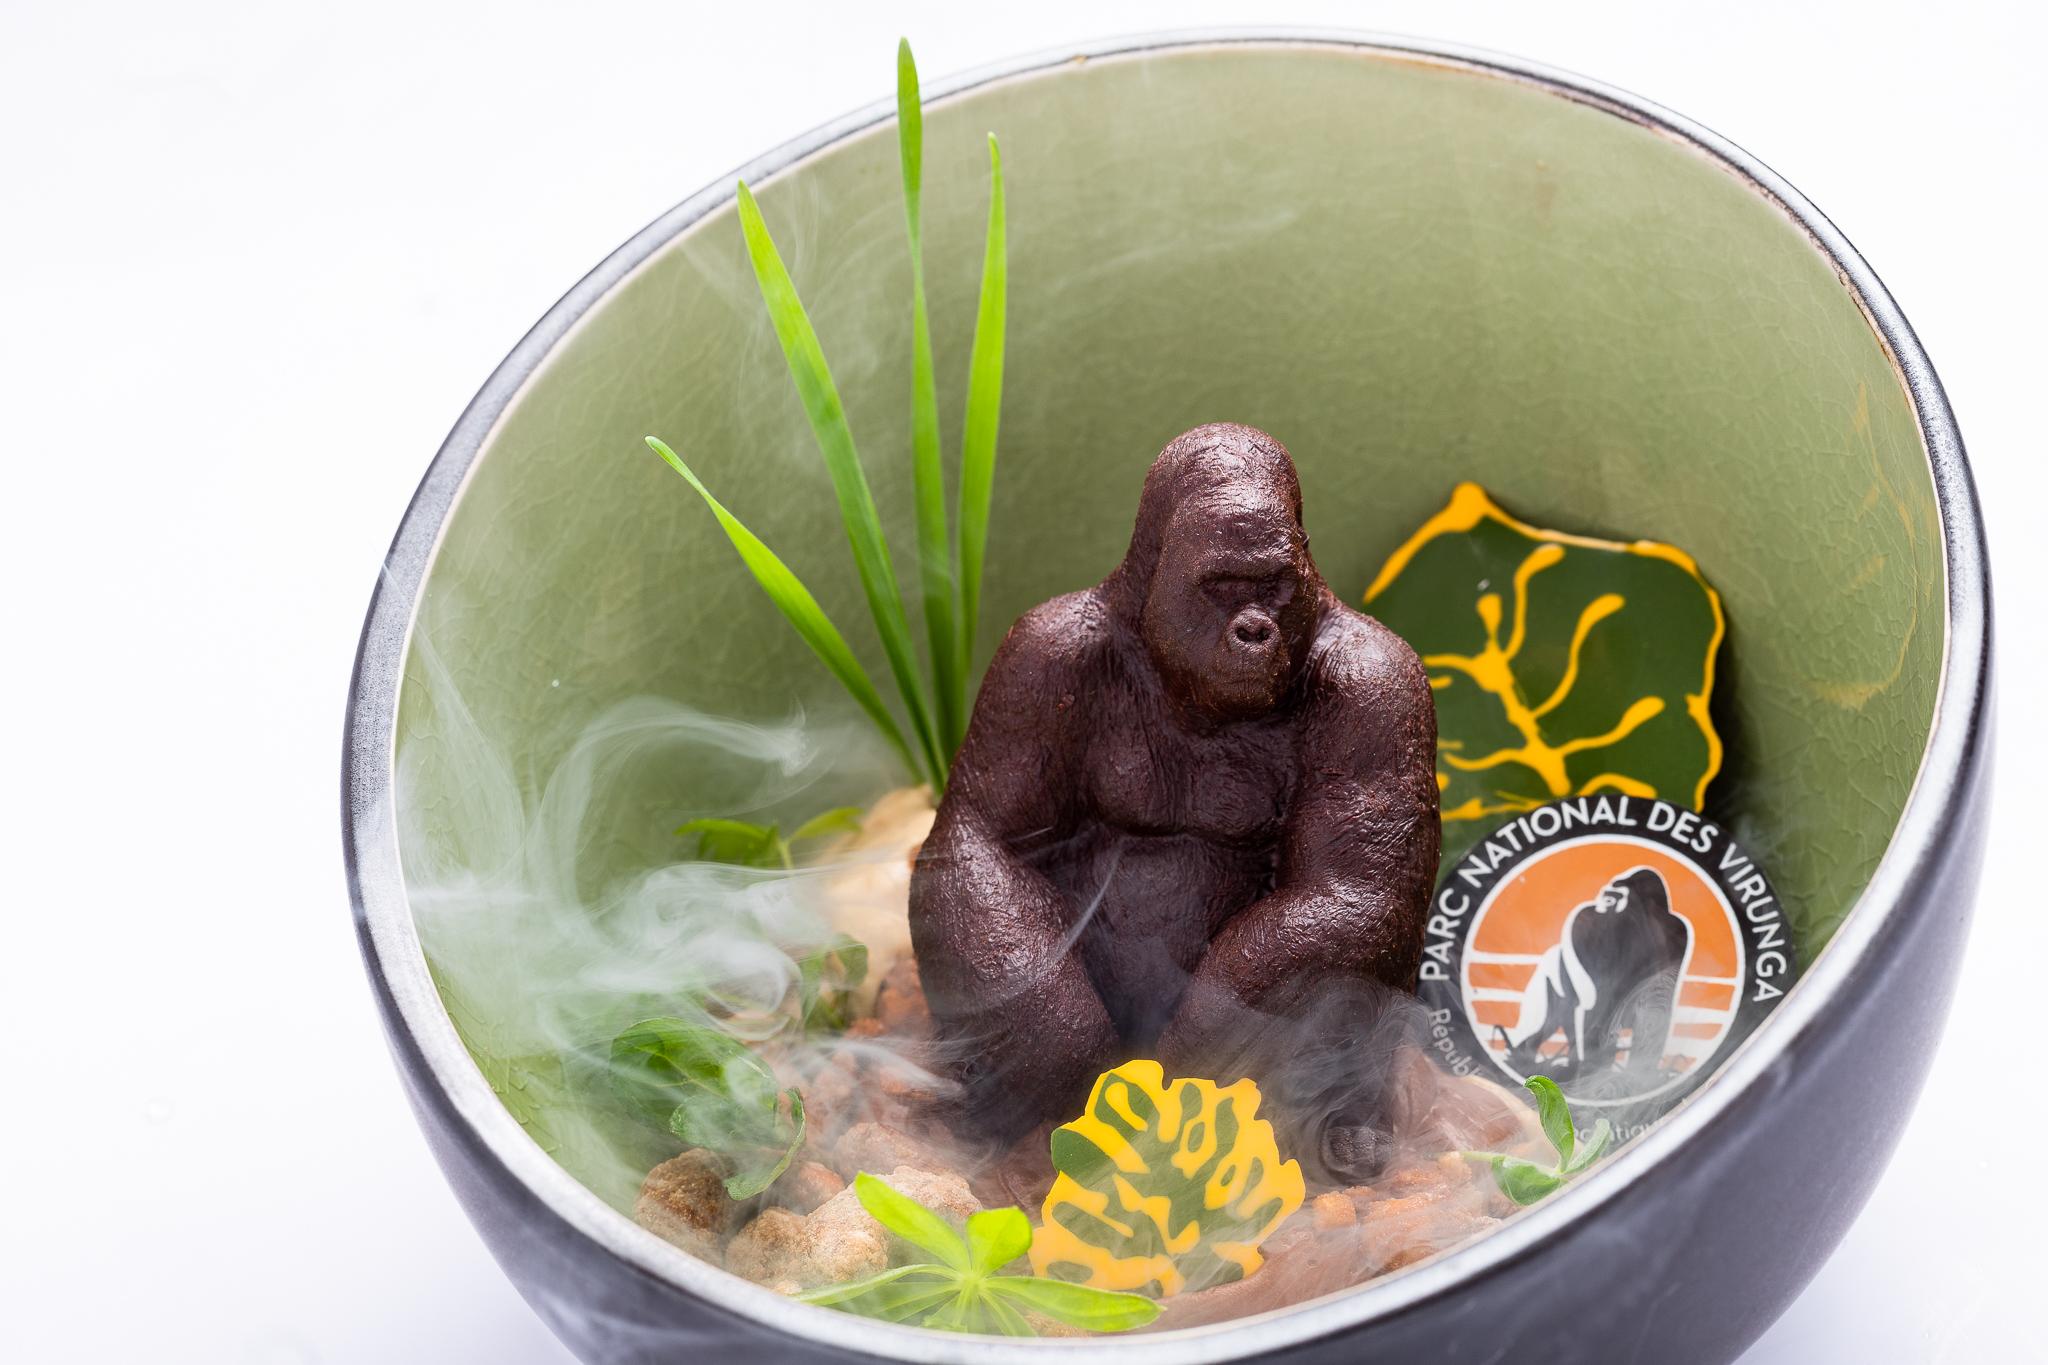 Gorillas in the mist: Virunga-chocolade, hazelnoot, appel, zuring - THE CHOCOLATE LINE